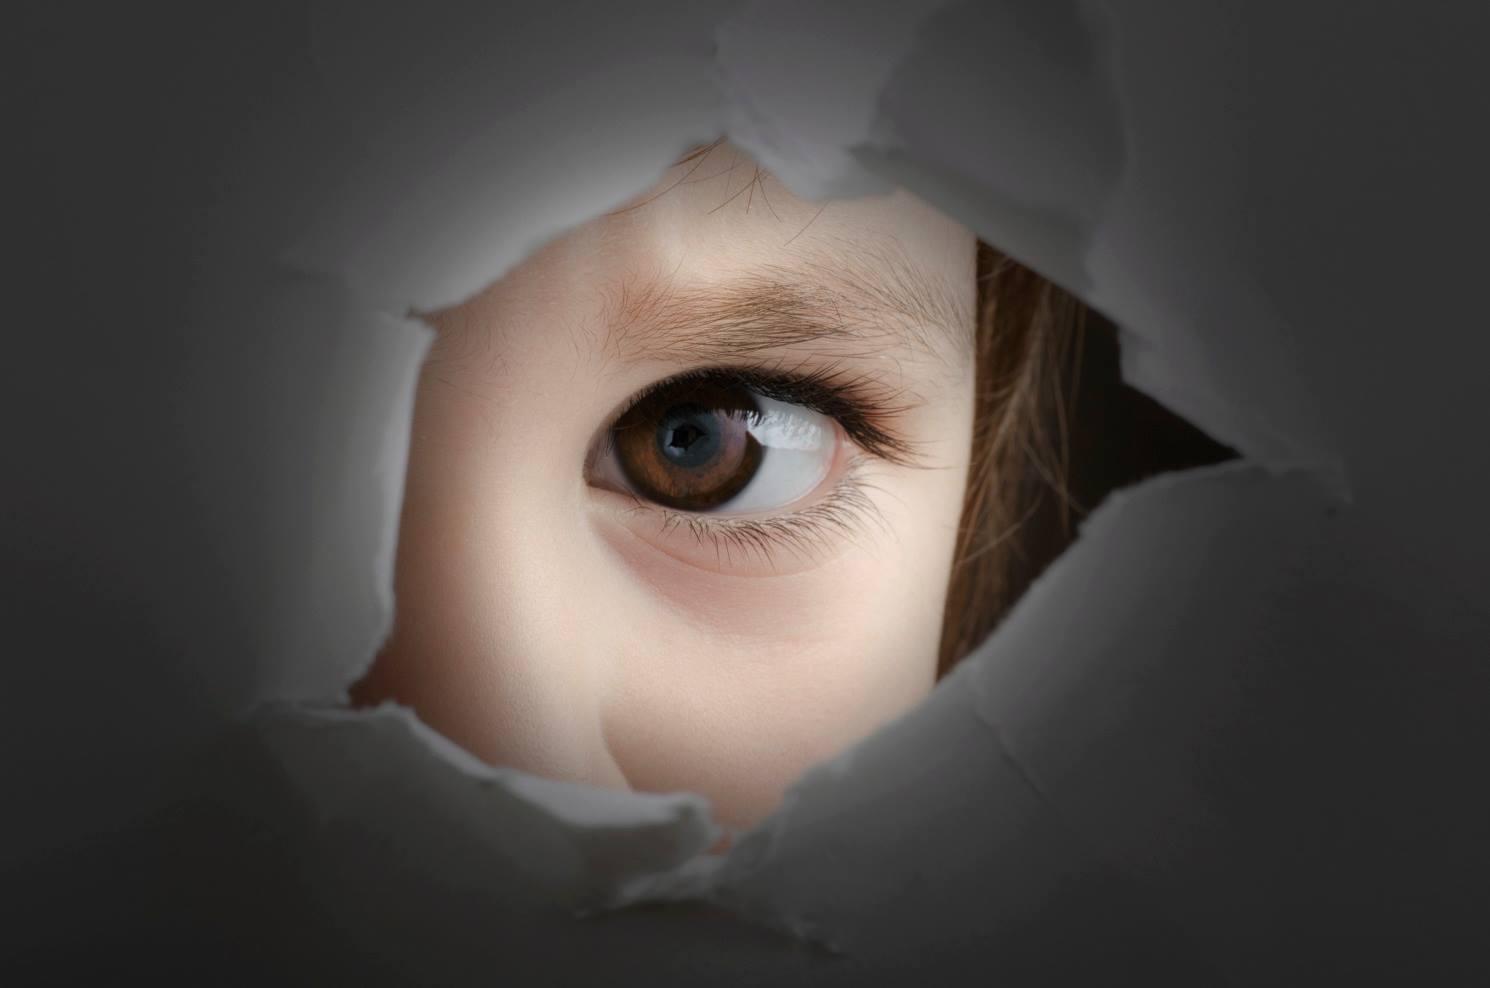 Senfølger efter seksuelle overgreb i barndommen